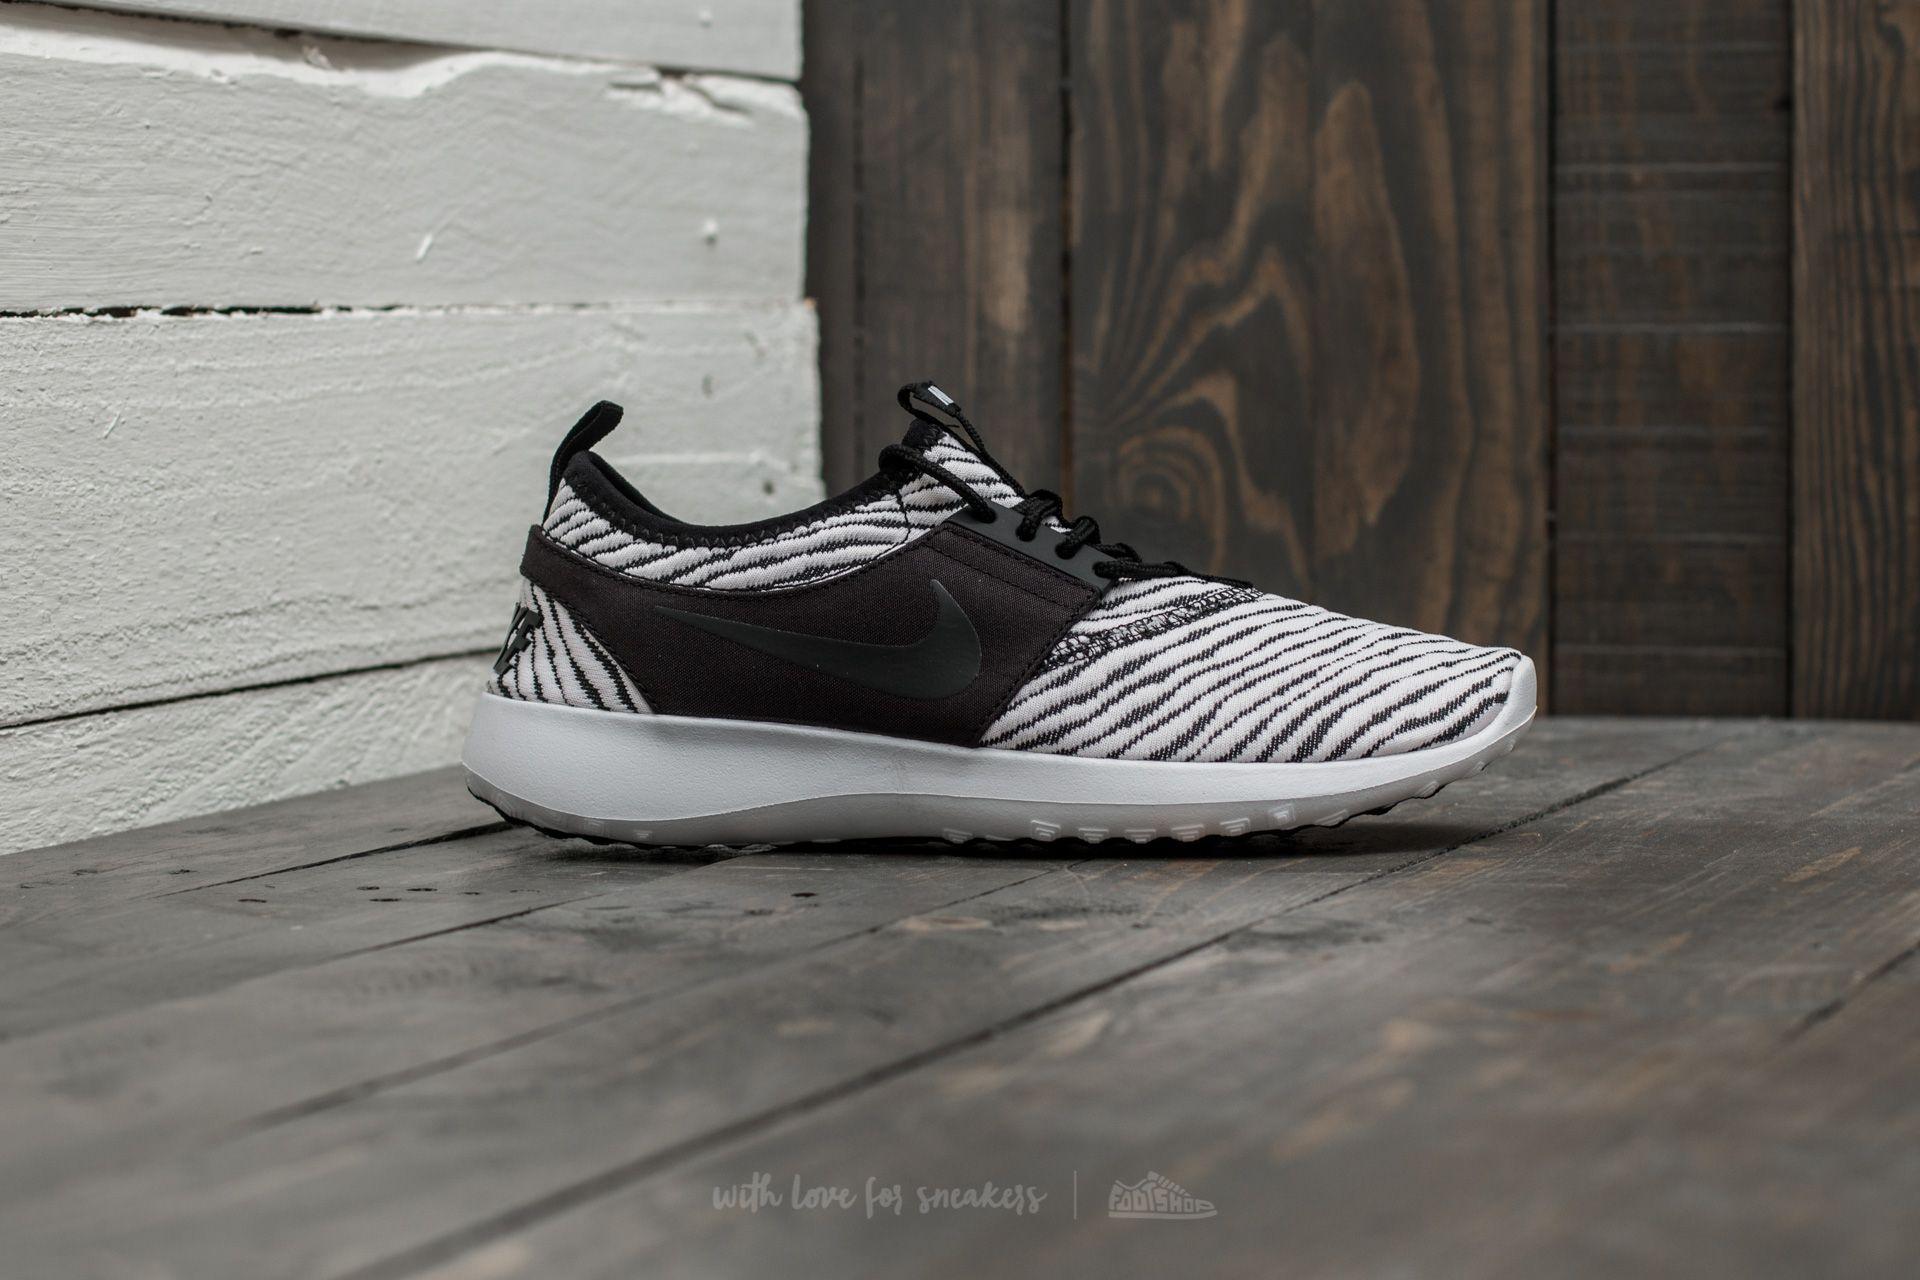 domingo coger un resfriado Infectar  Women's shoes Nike W Juvenate SE Black/ Black-White